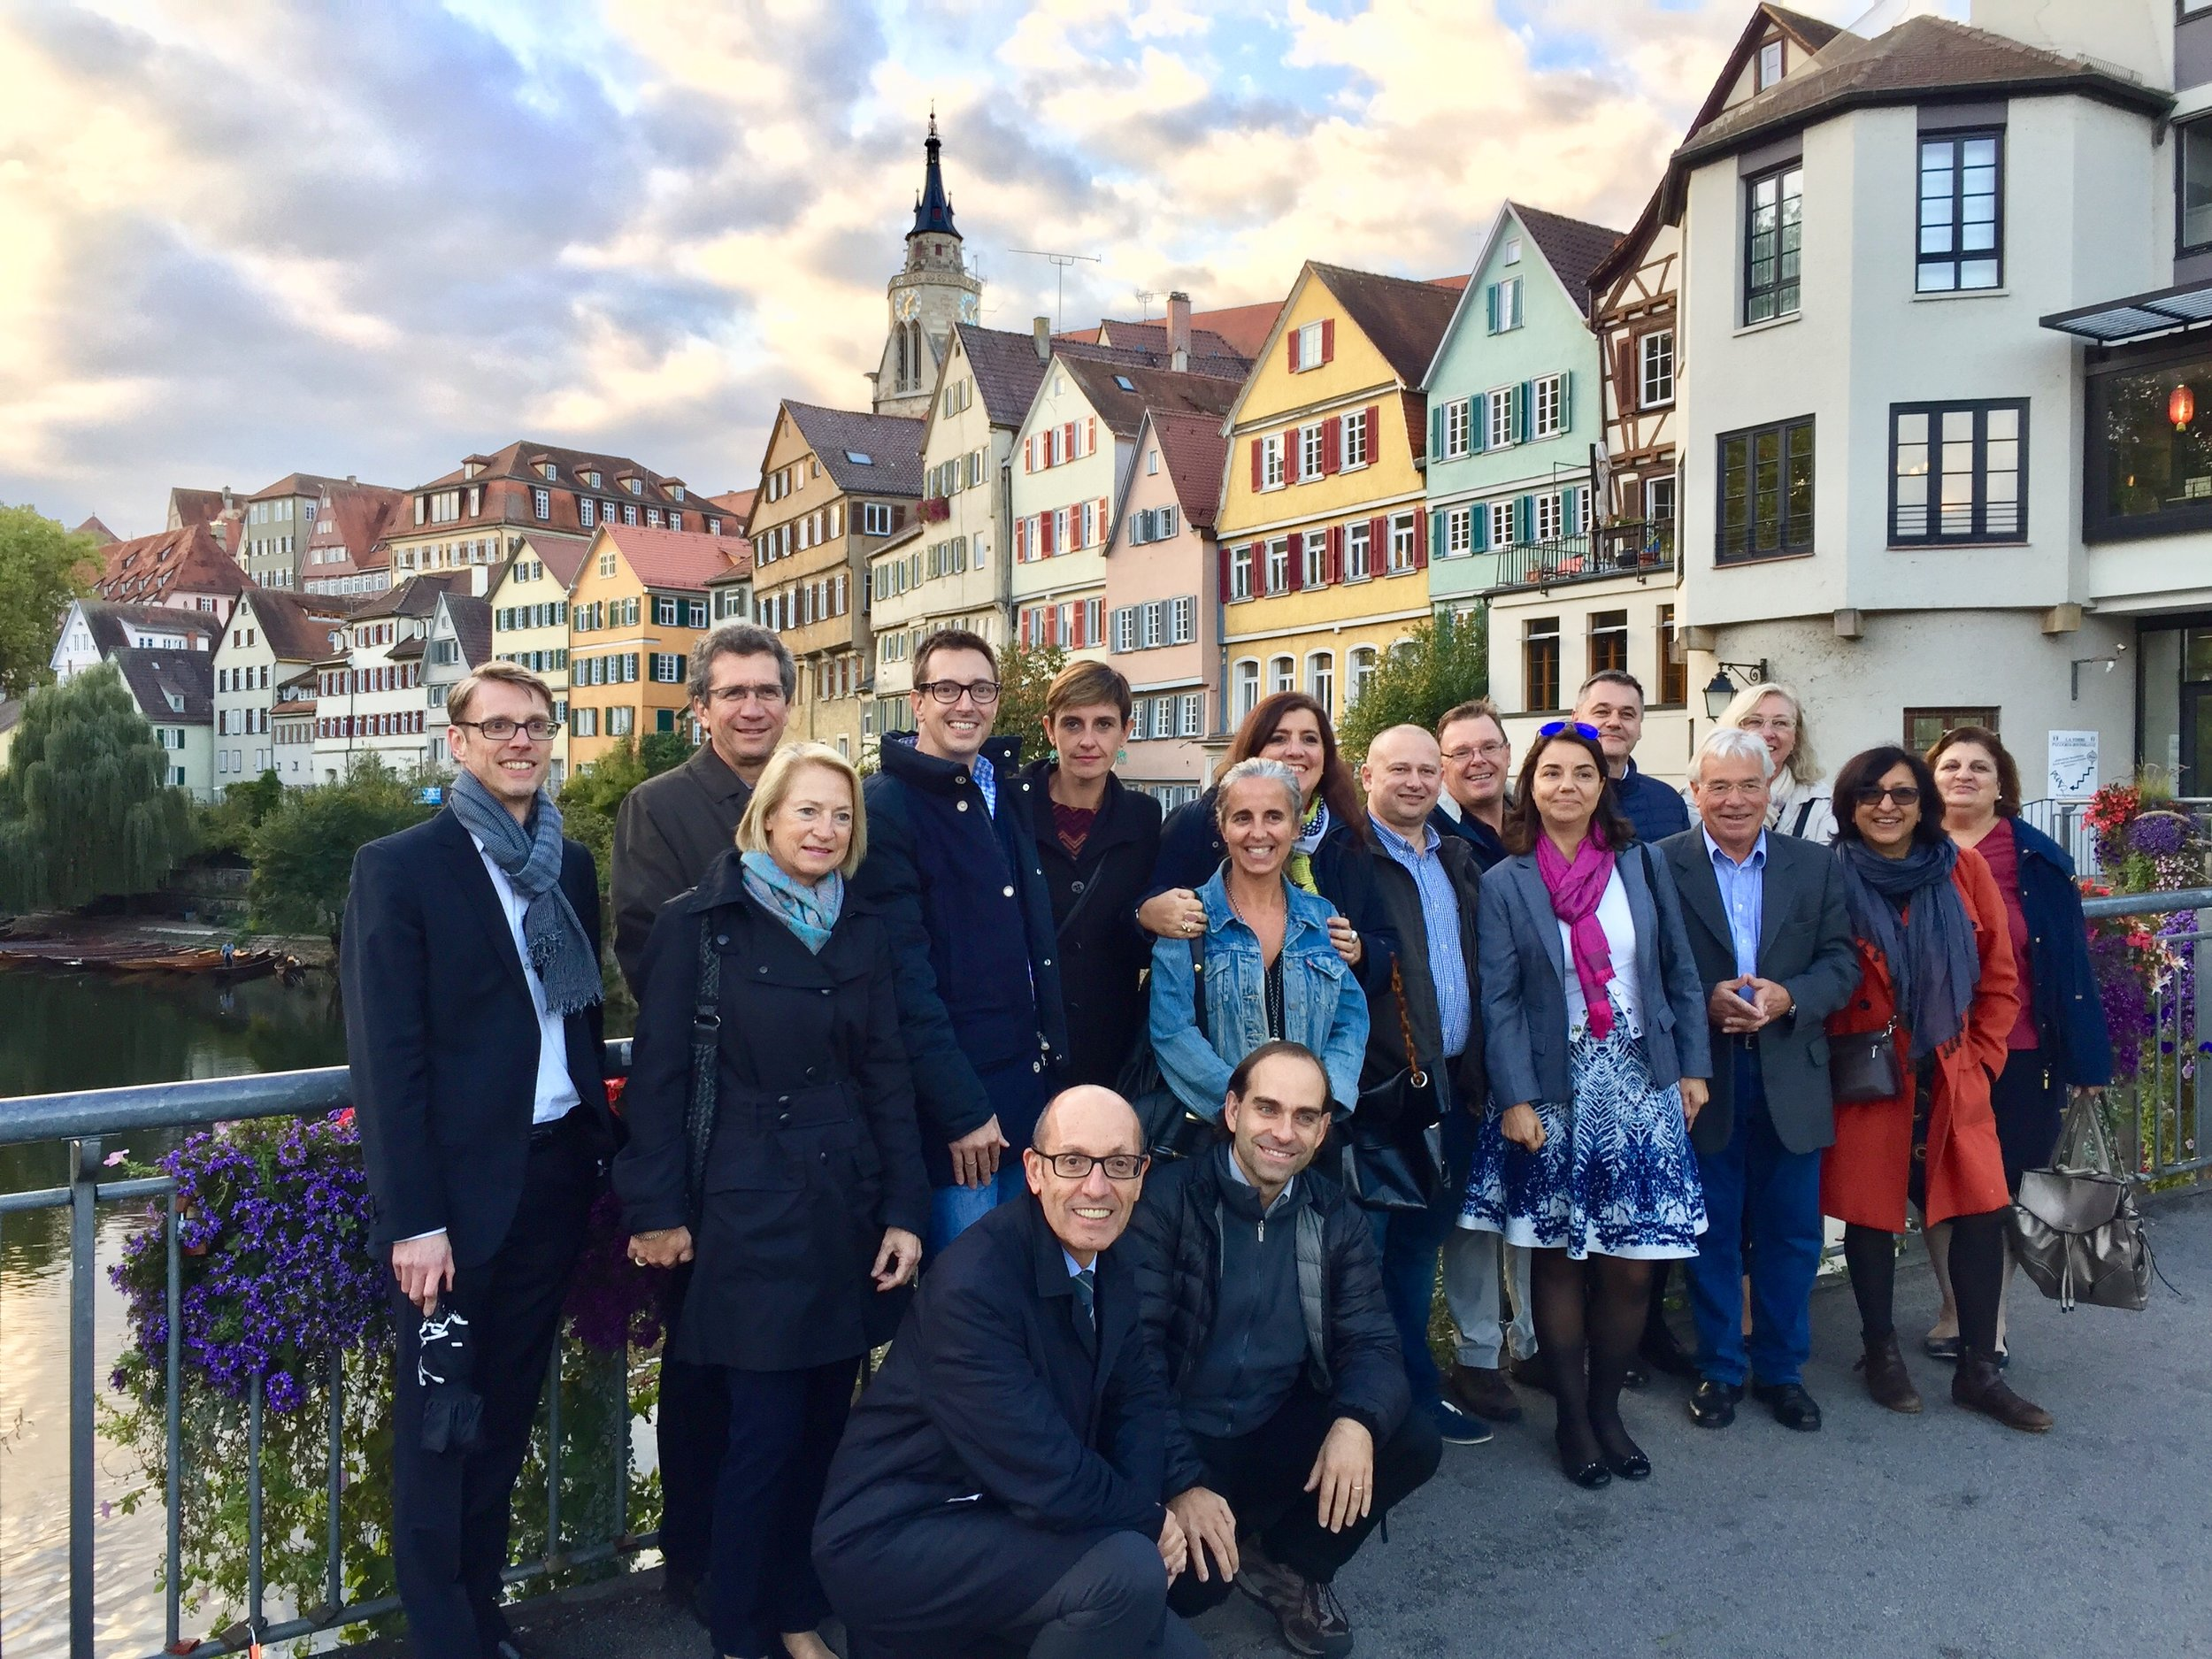 IMG_3291-Tubingen Rise meeting oct 2017.jpg